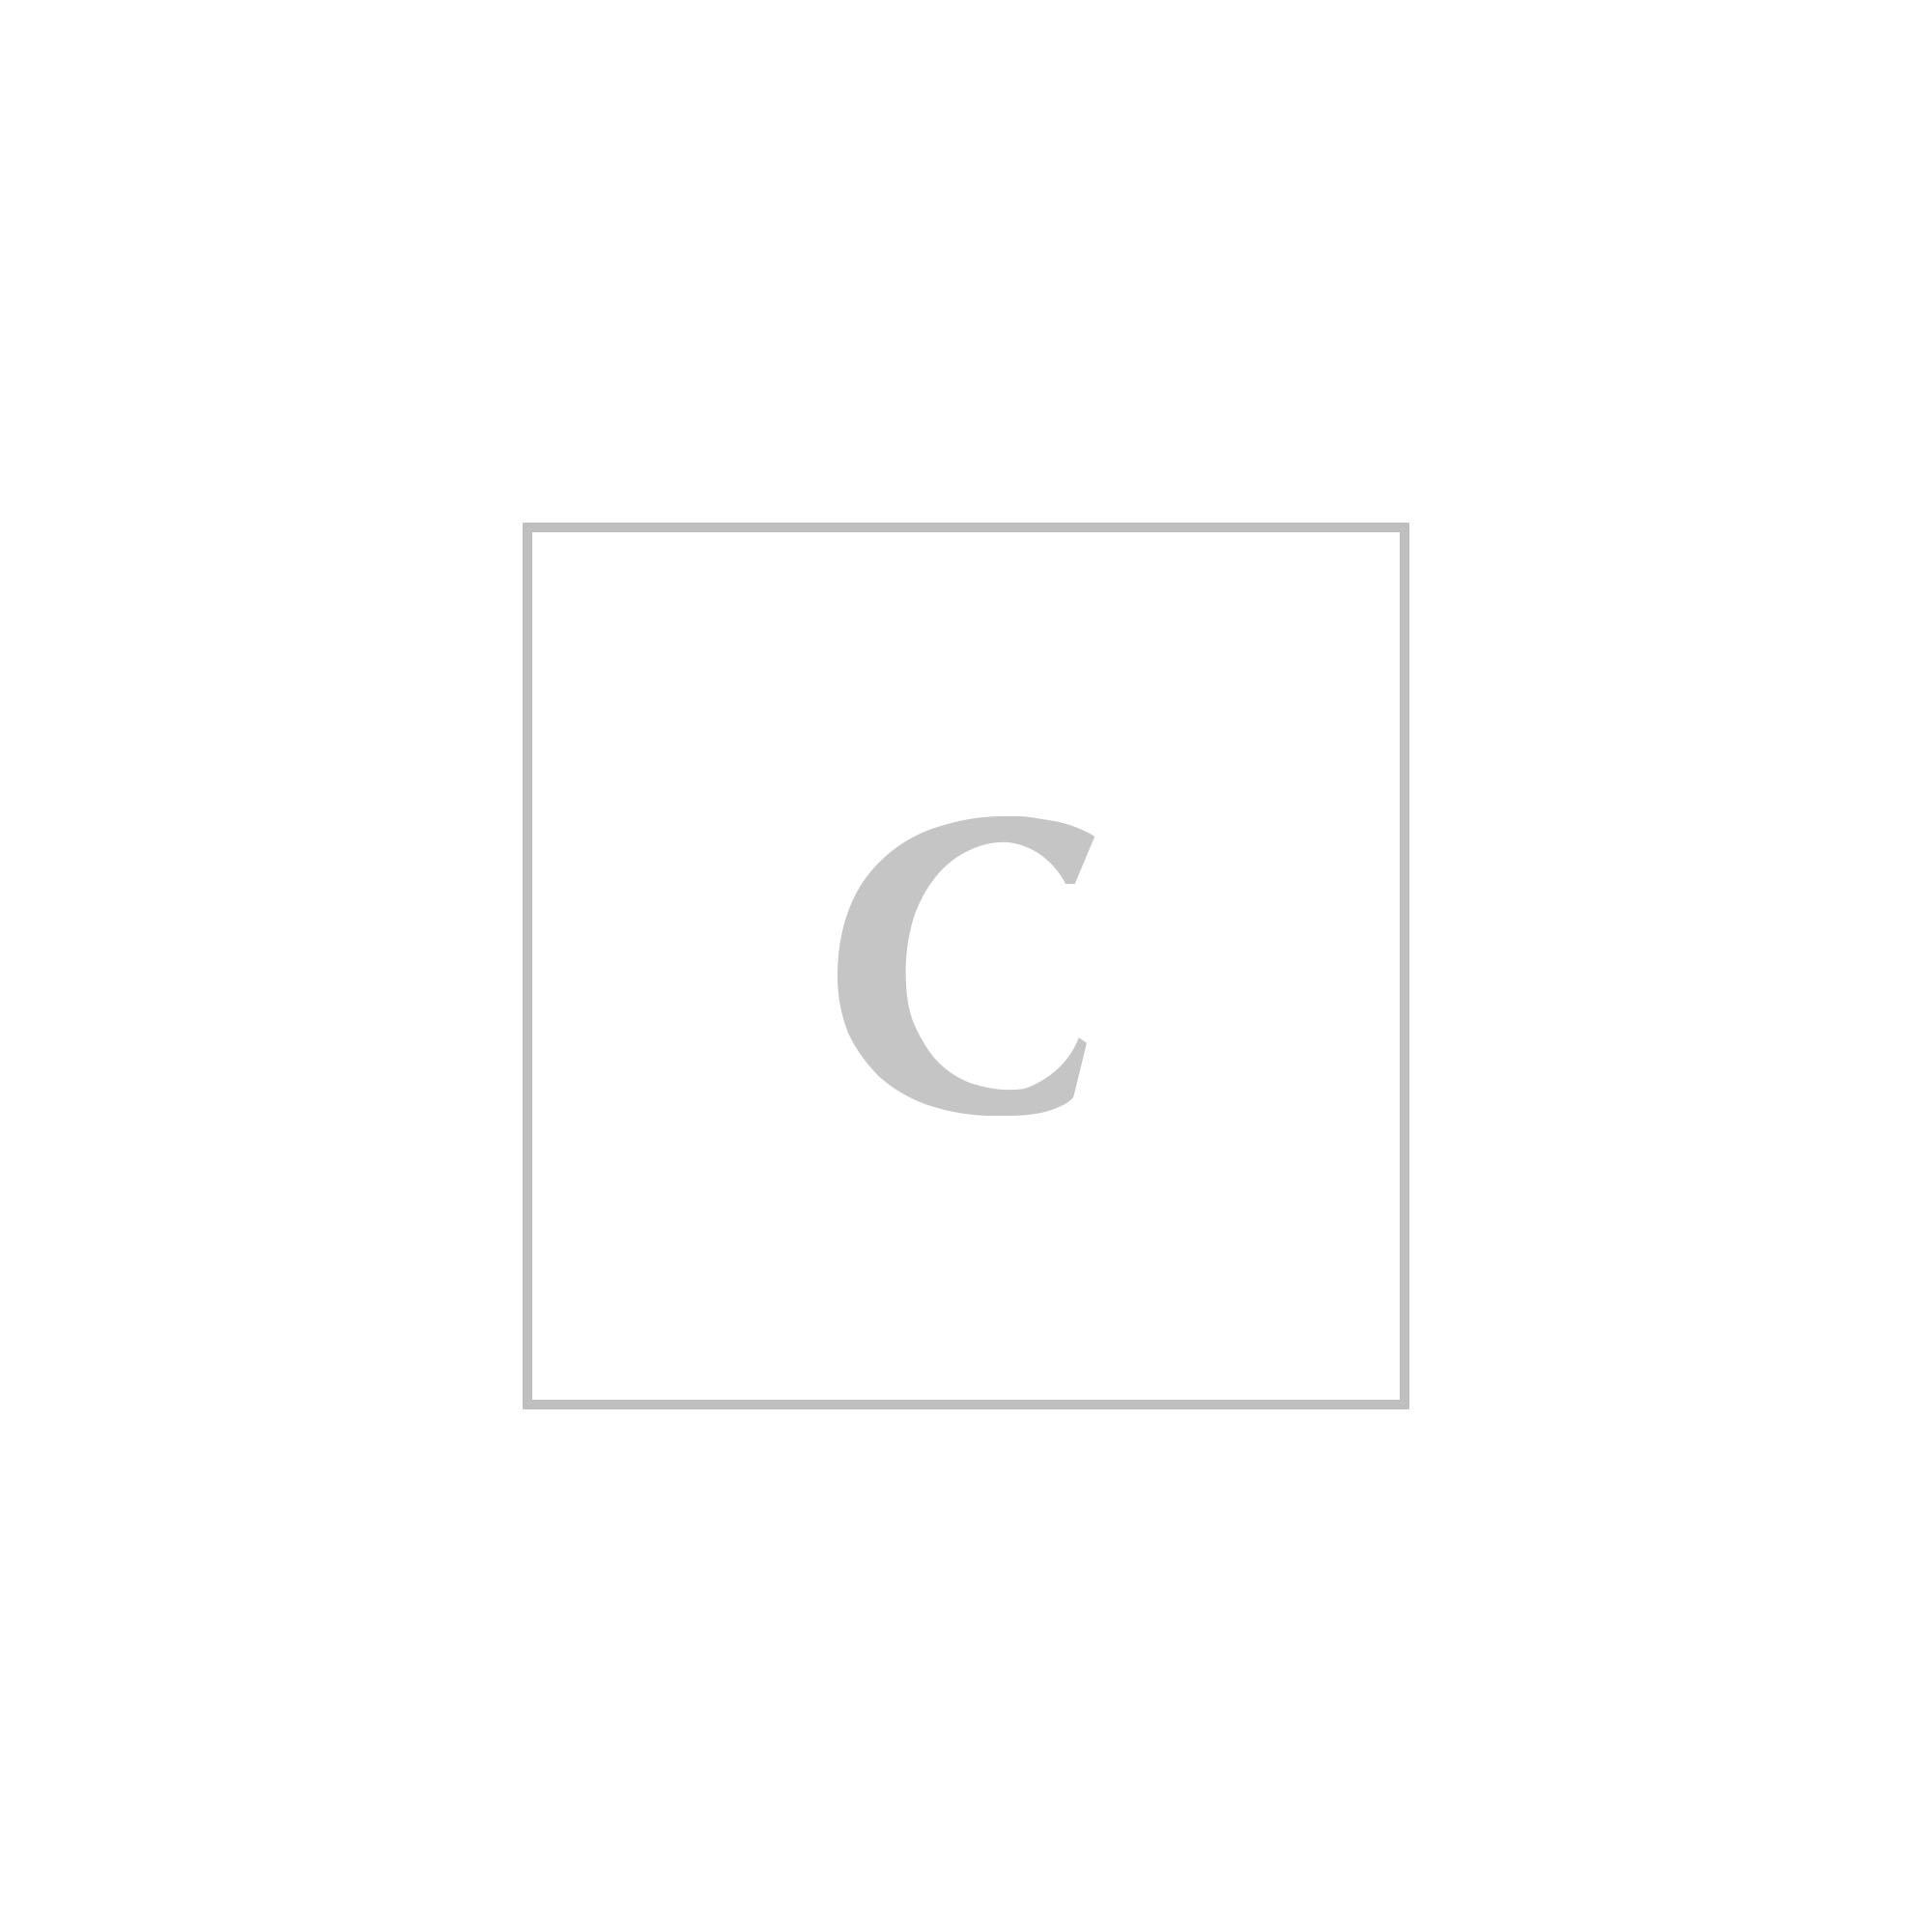 Saint laurent ysl borsa maniglia corta monogramme portachiavi